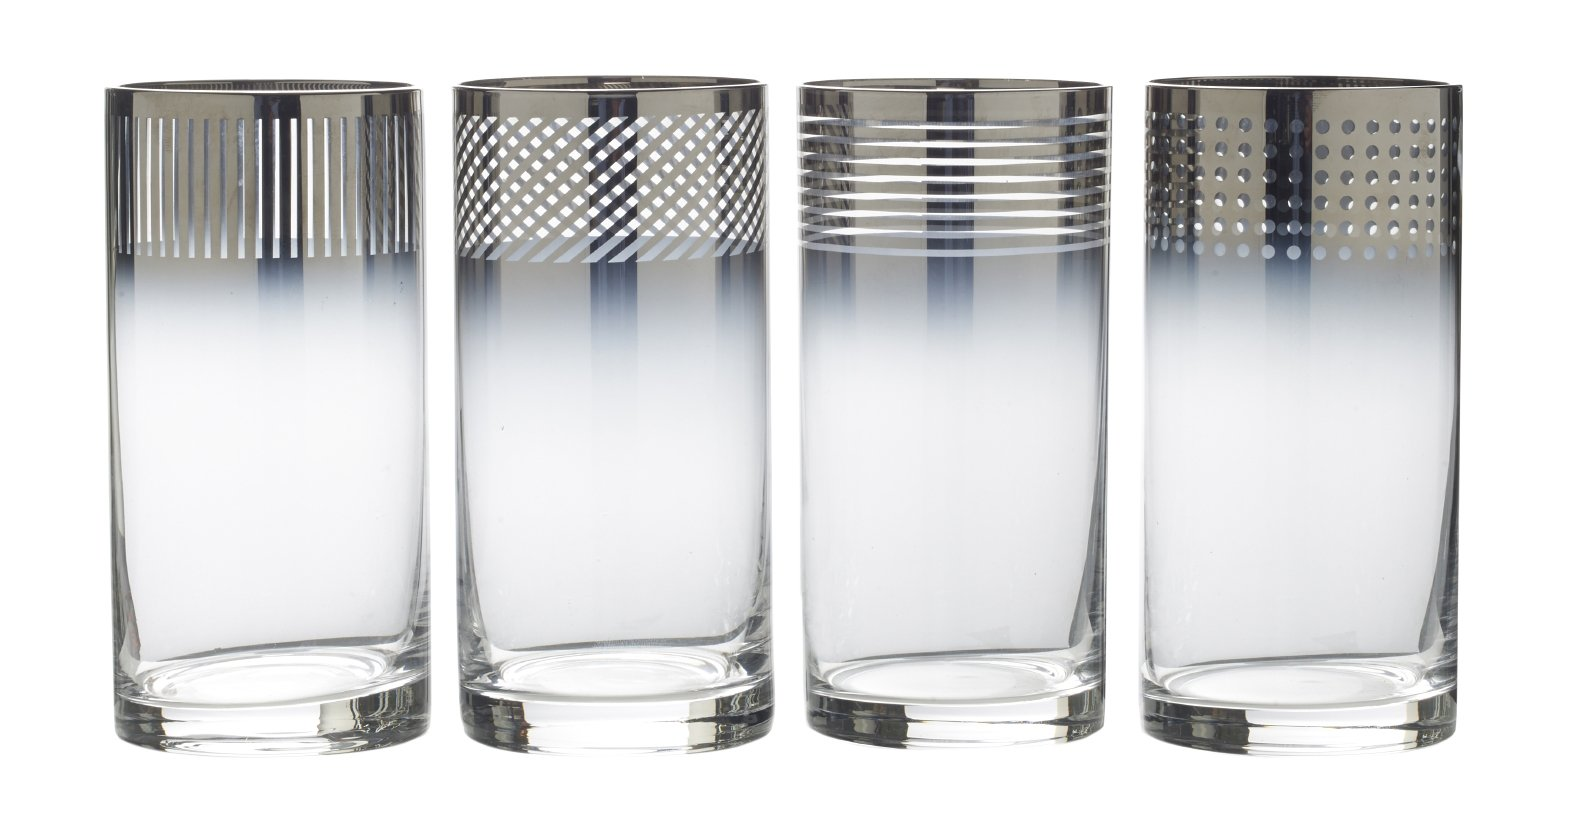 Mikasa Cheers Metallic Ombre Highball Glass, 18-Ounce, Set of 4 by Mikasa